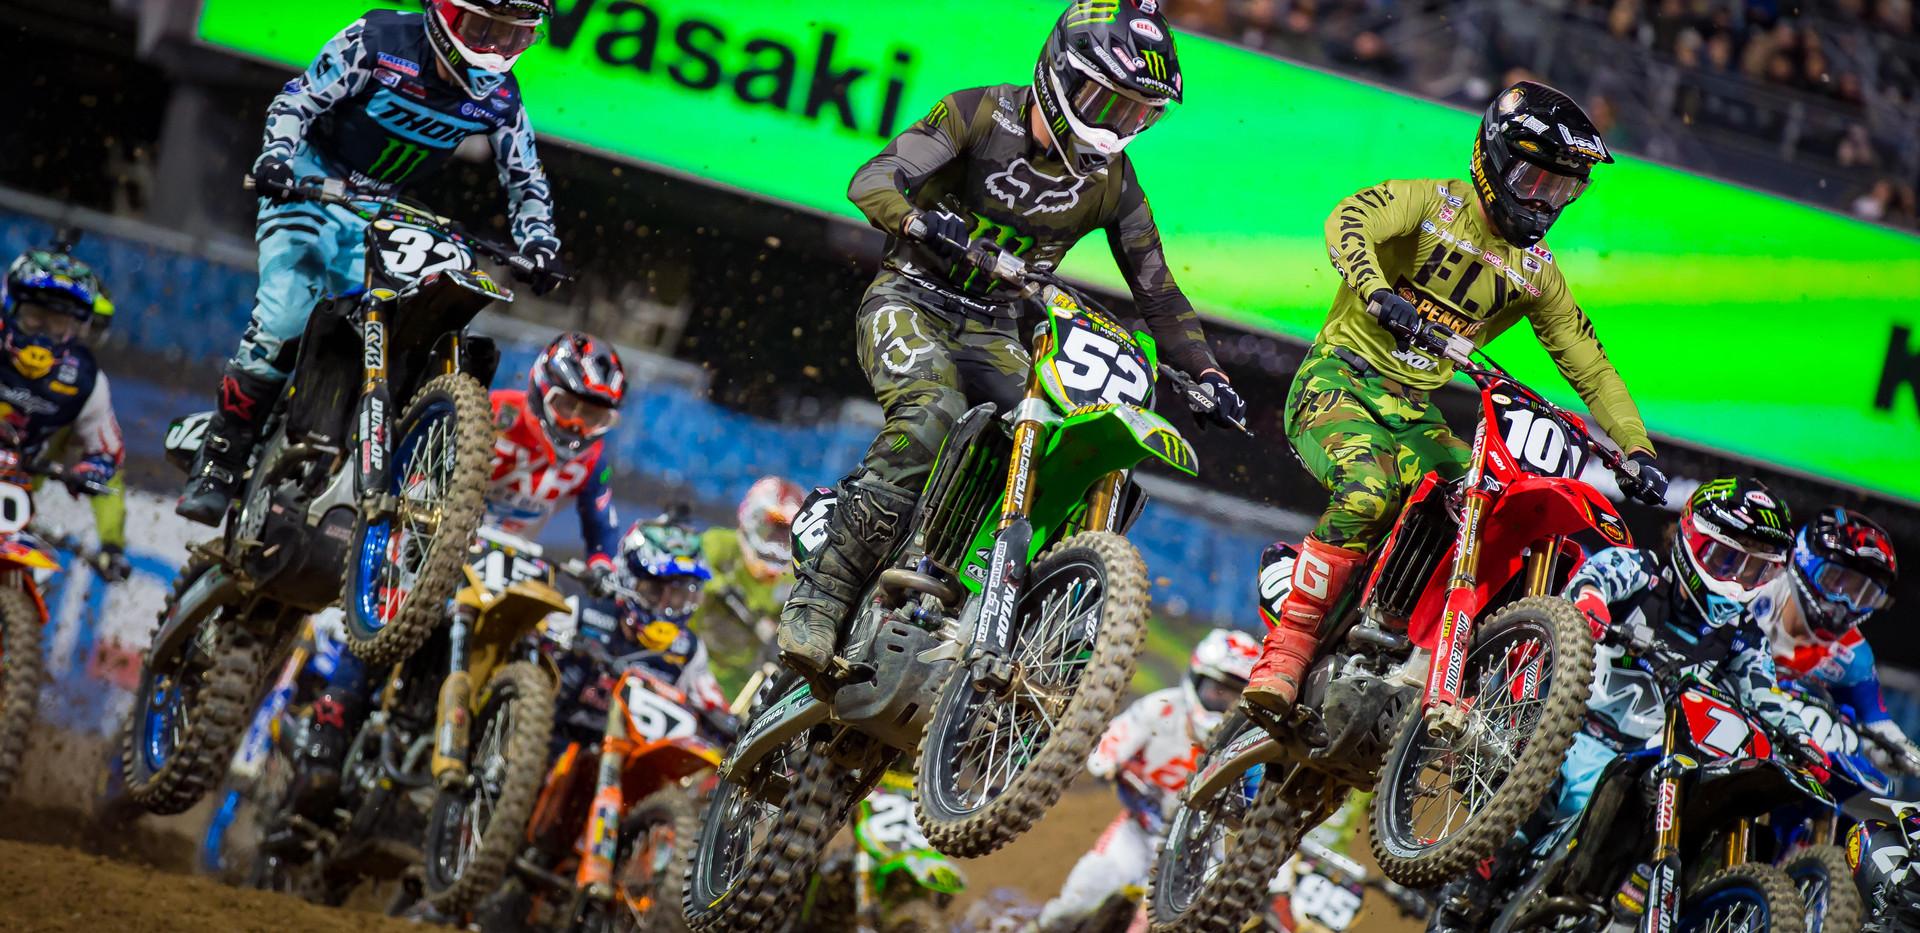 SD_SX_RACE_OWENS_180.jpg